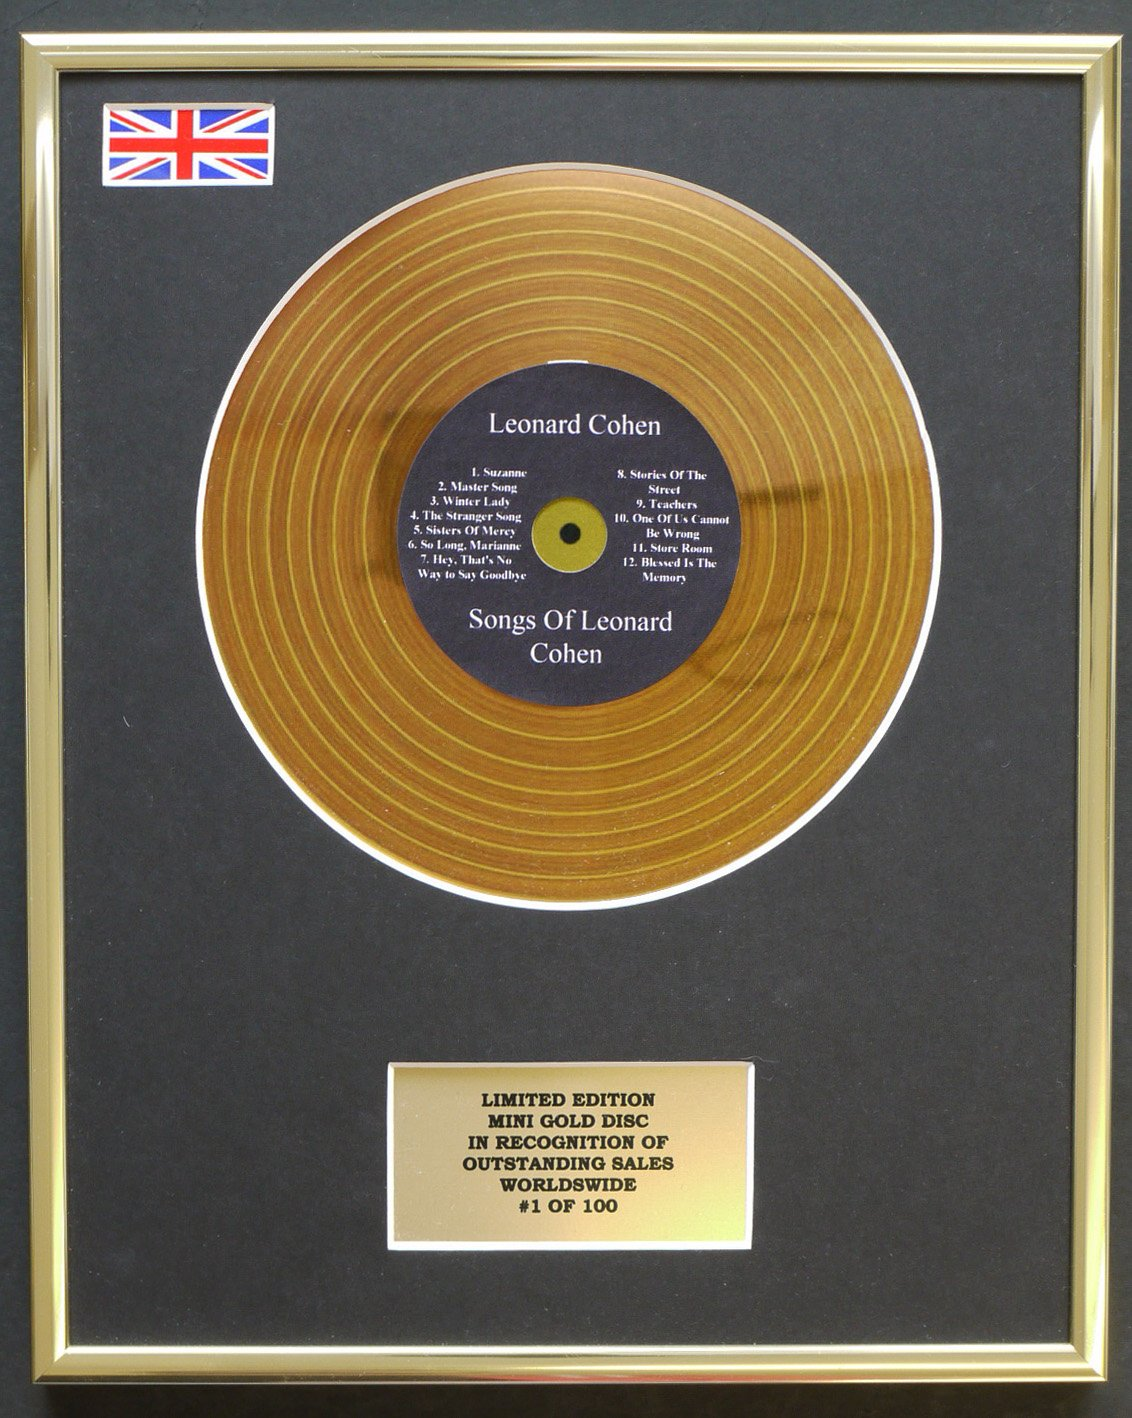 Limited Edition Cd Display LEONARD COHEN//MINI METAL GOLD DISC//EDICI/ÓN LIMITADA//COA//SONGS OF LEONARD COHEN